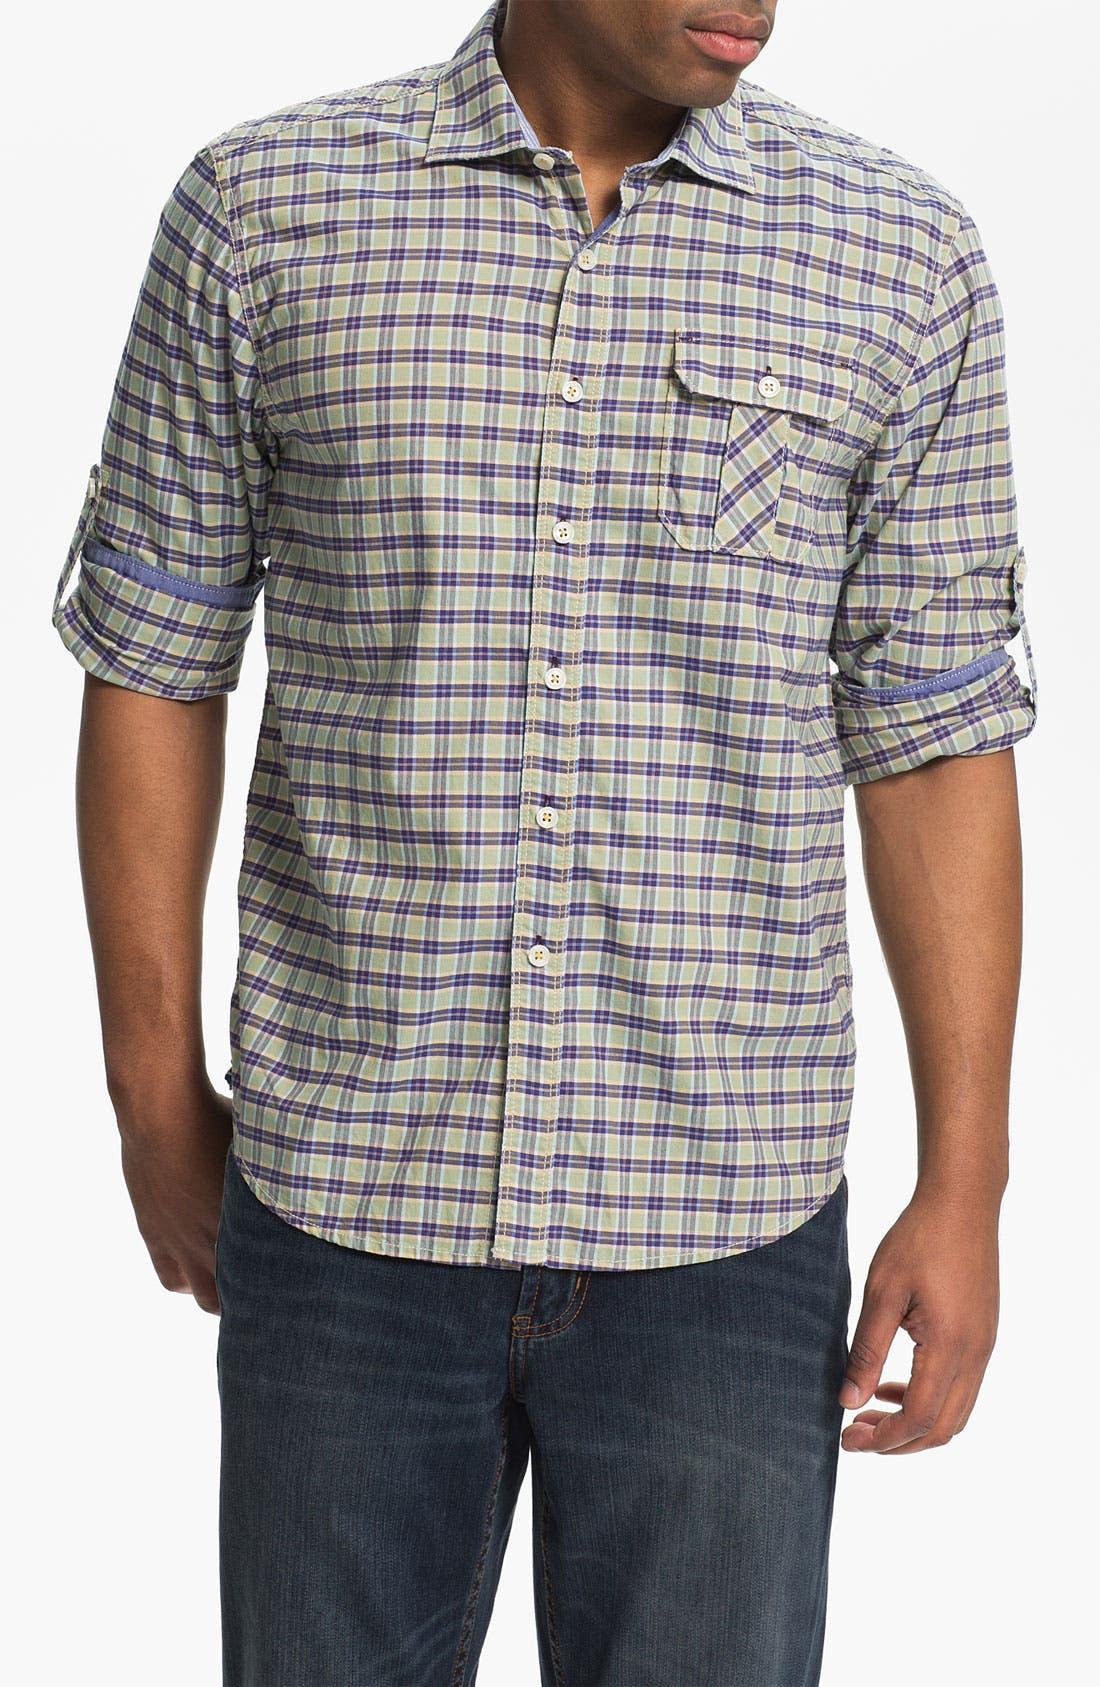 Alternate Image 1 Selected - Tommy Bahama Denim 'Niko' Sport Shirt